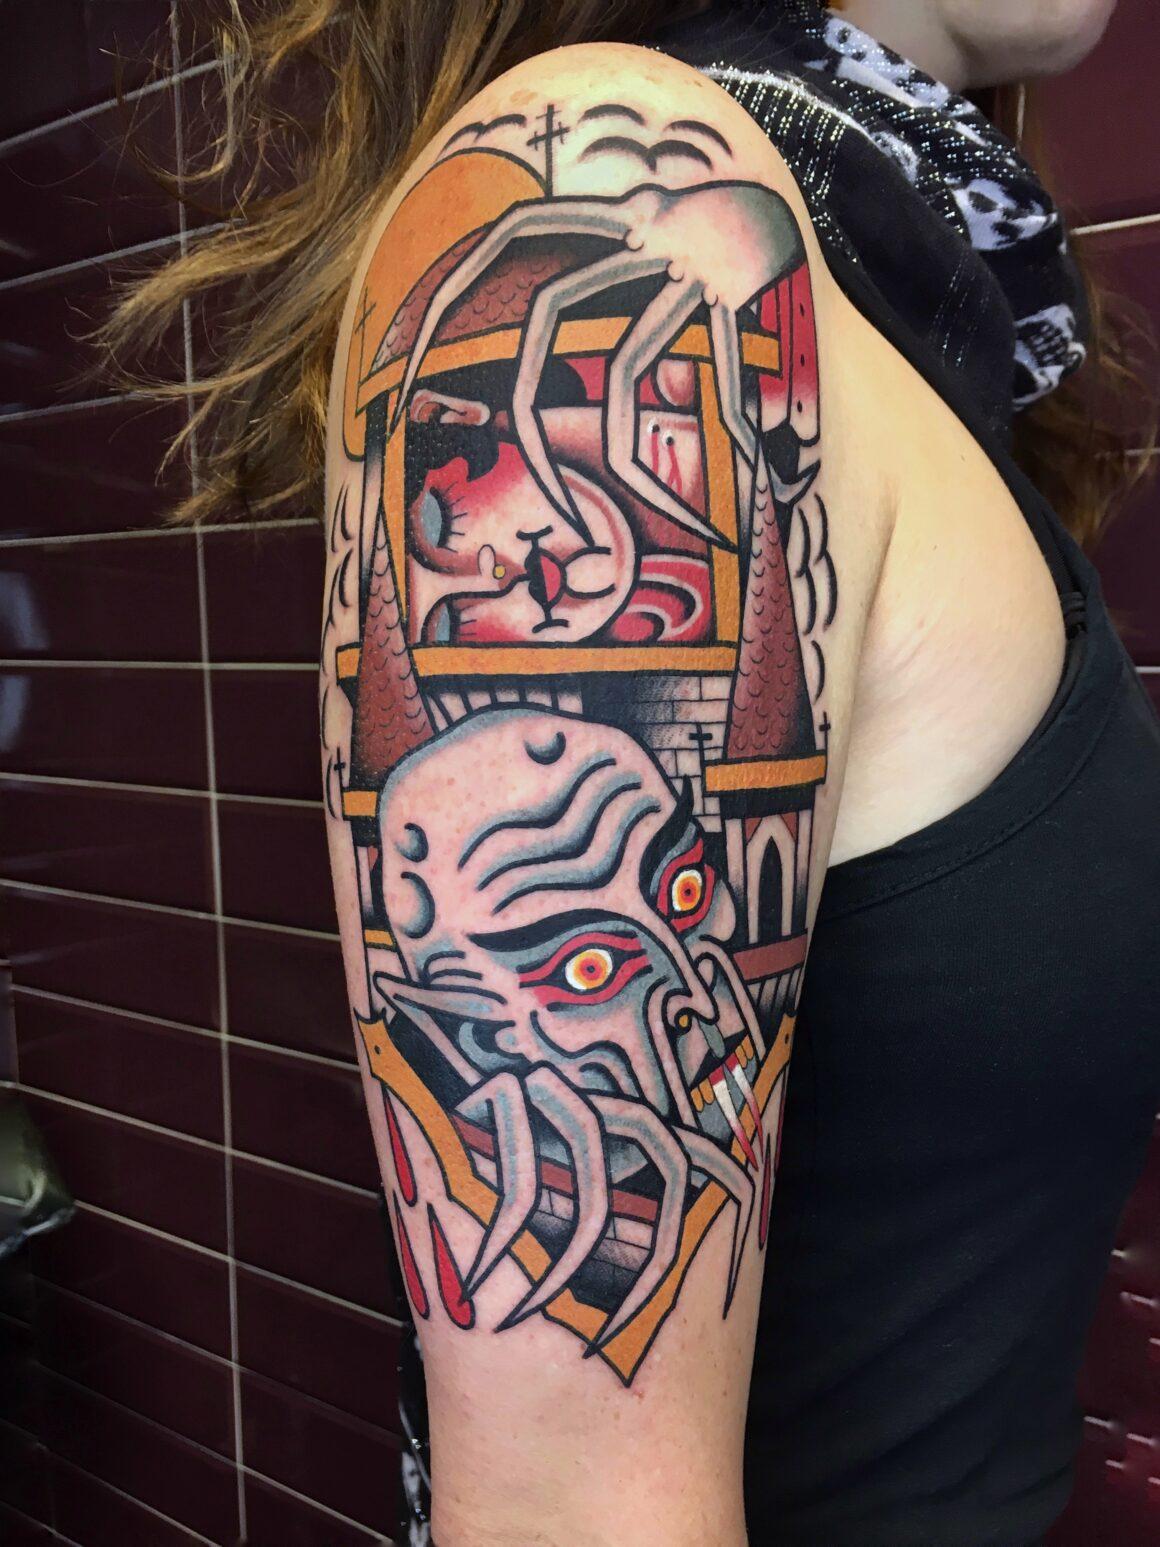 Francesco Garbuggino, Ink 'N' Roll Tattoo, Genova, Italy